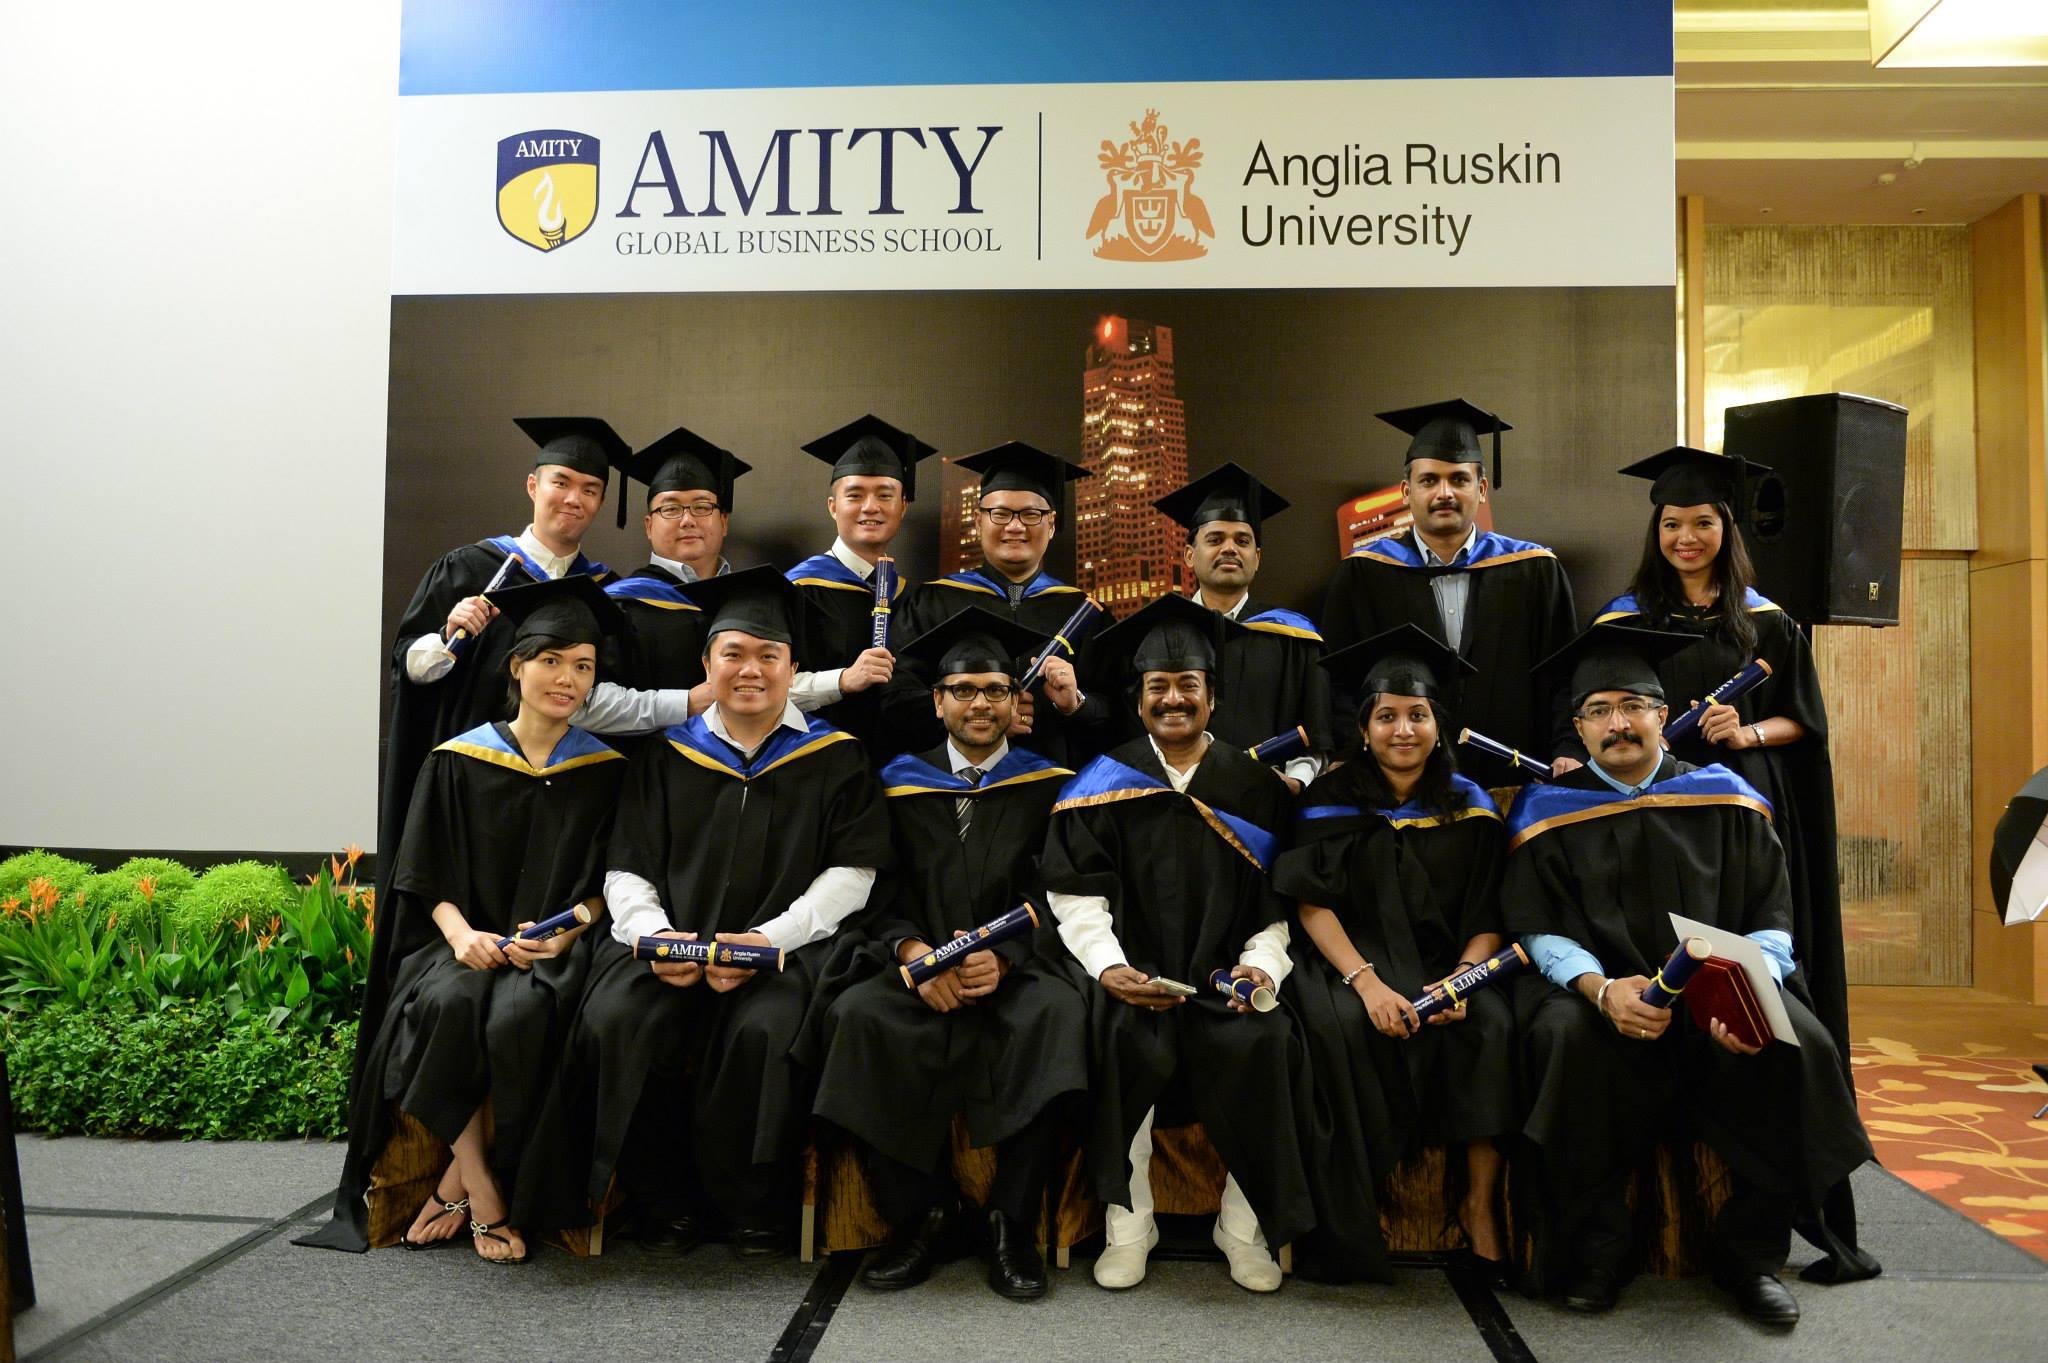 Trường học viện Aamity, Singapore